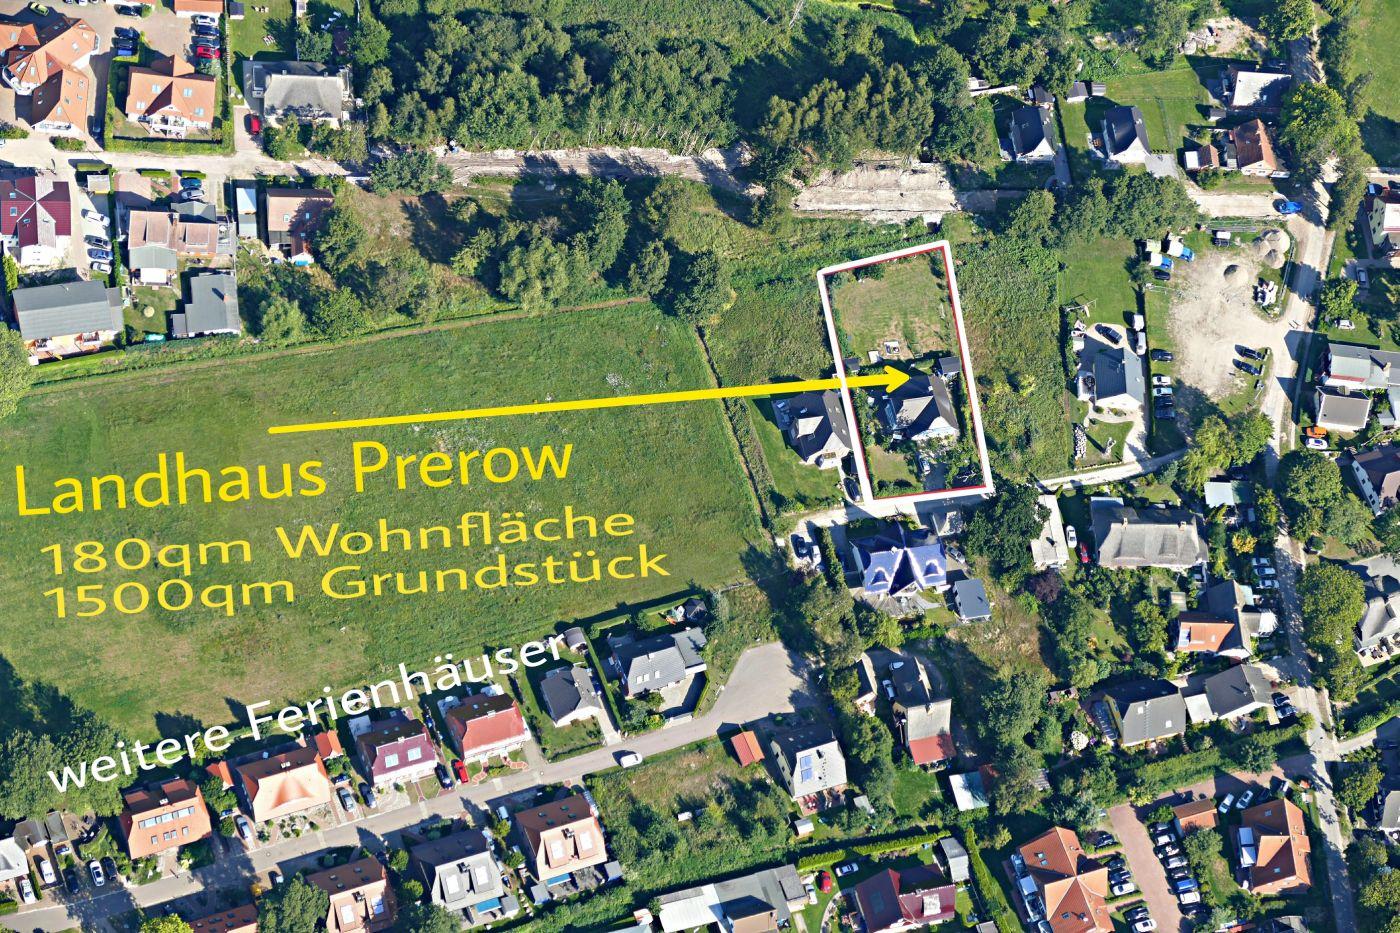 Luftaufnahme Ferienhaus Landhaus Prerow